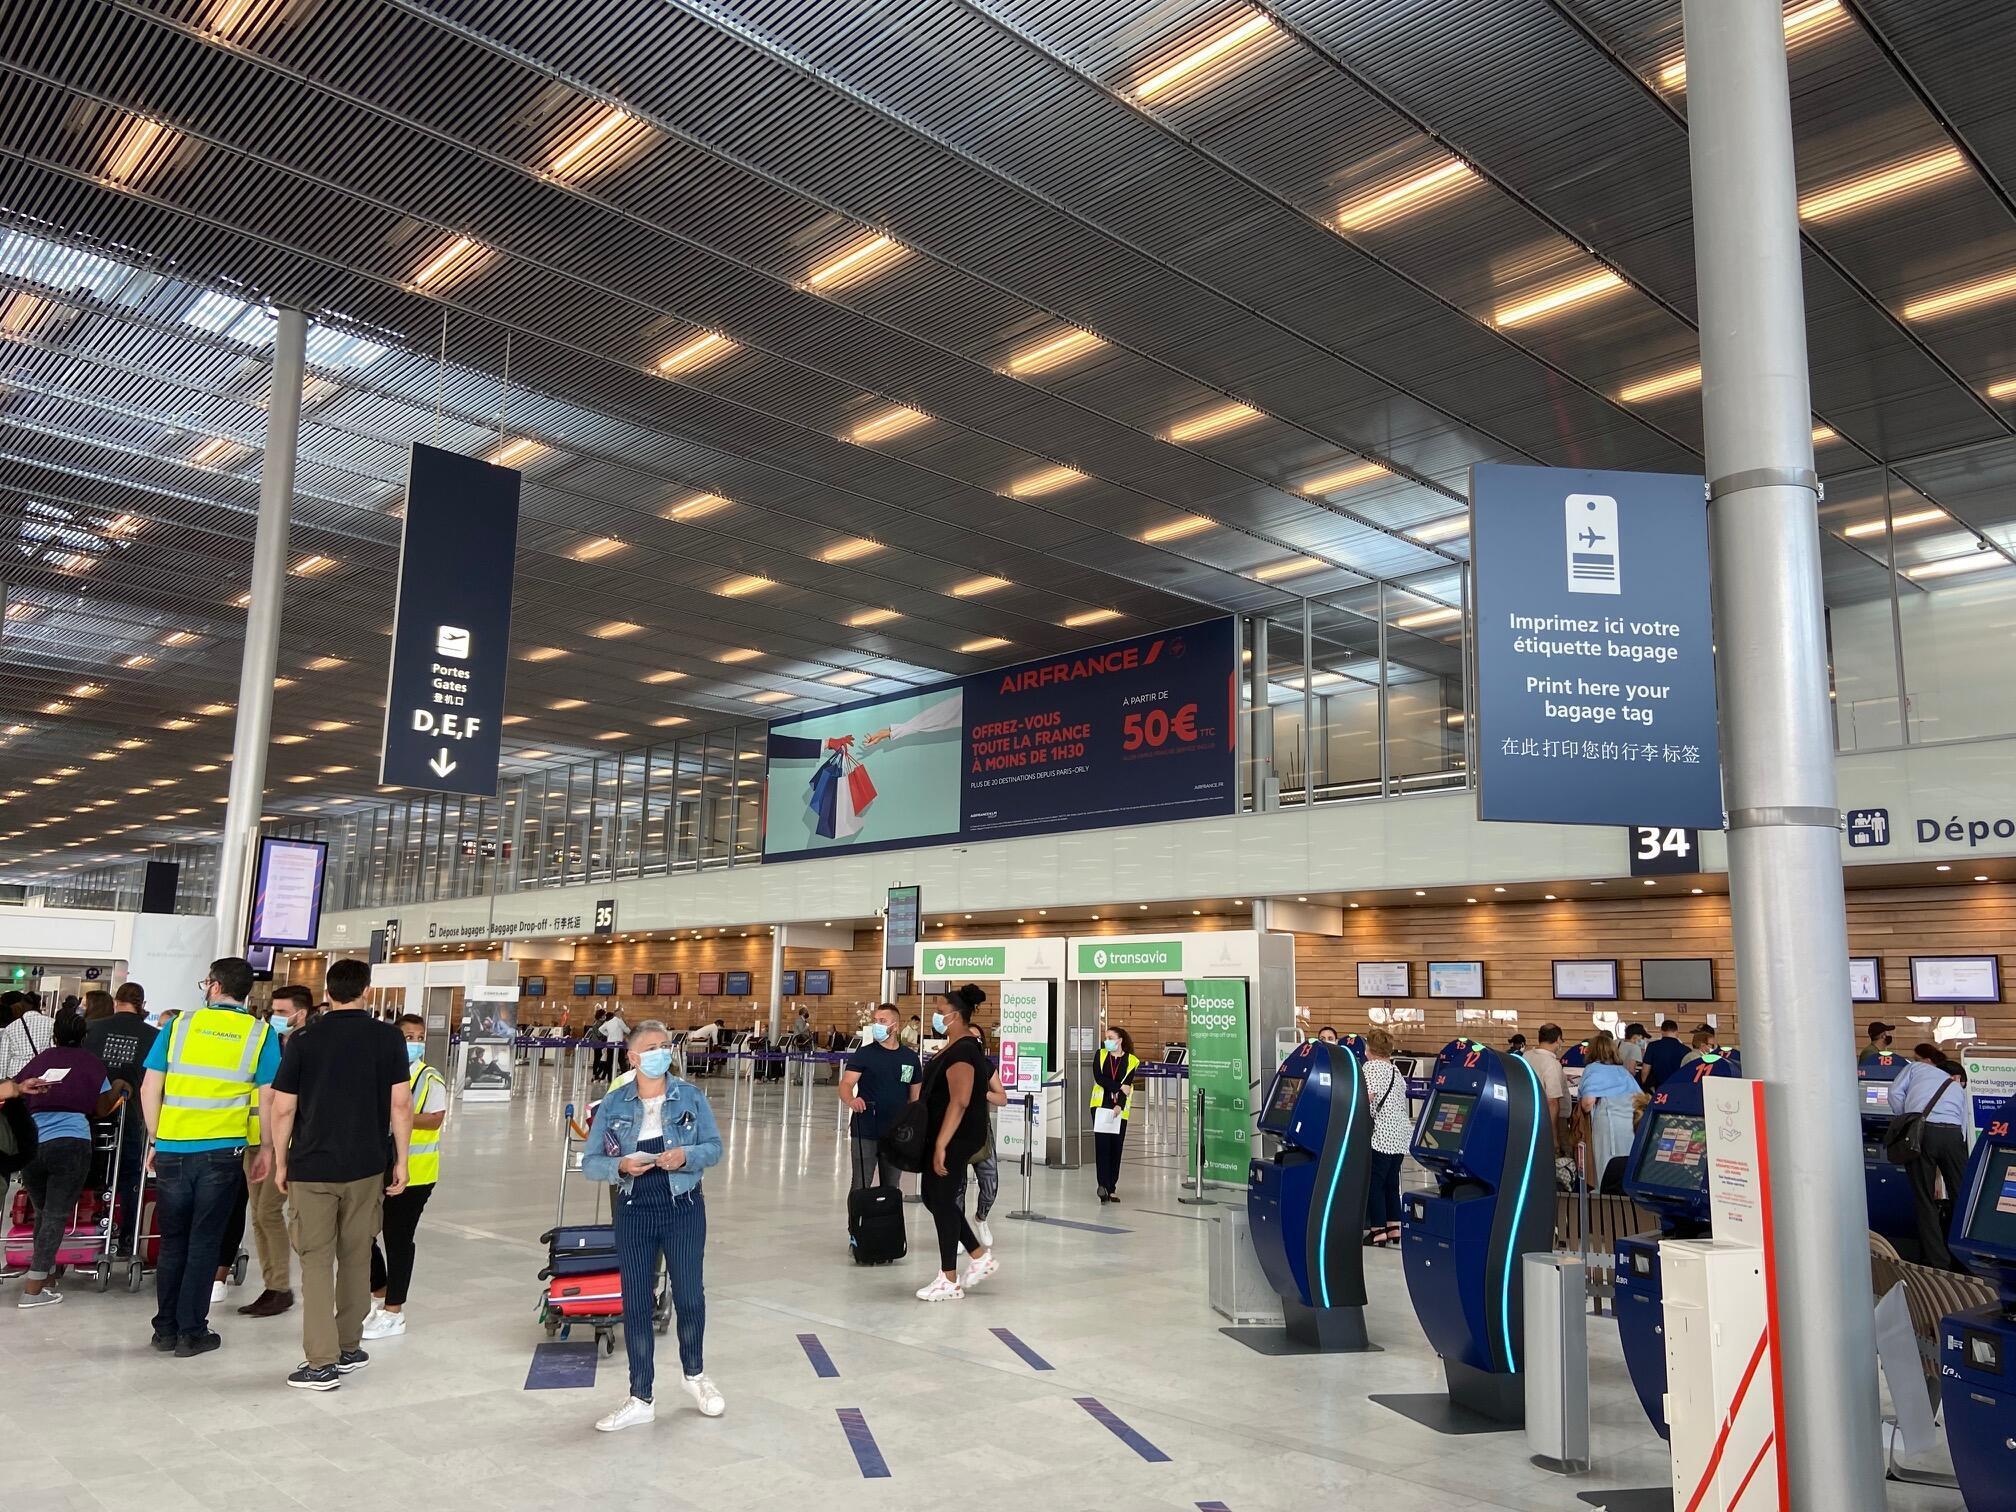 Aeroporto de Orly reabriu a 26 de Junho de 2020.